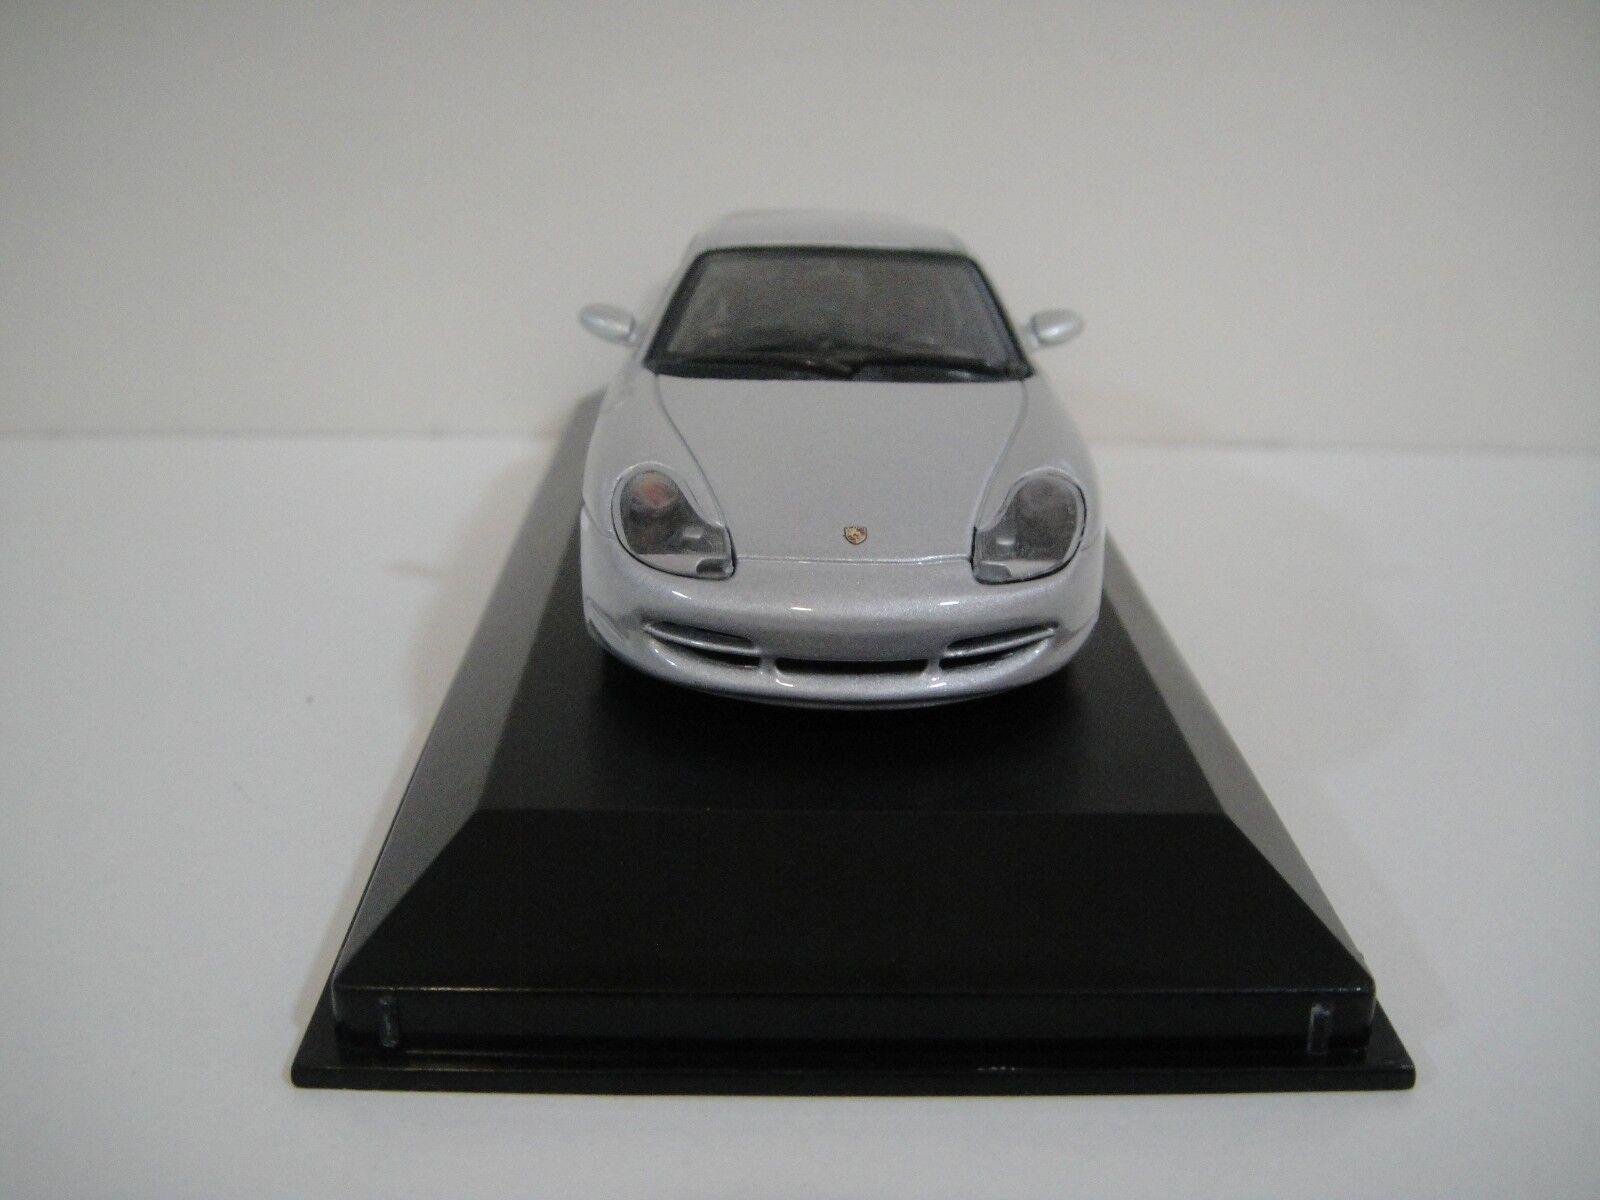 --1 43 MINICHAMPS. PORSCHE 911 911 911 GT3 STREET CAR plata fa747f